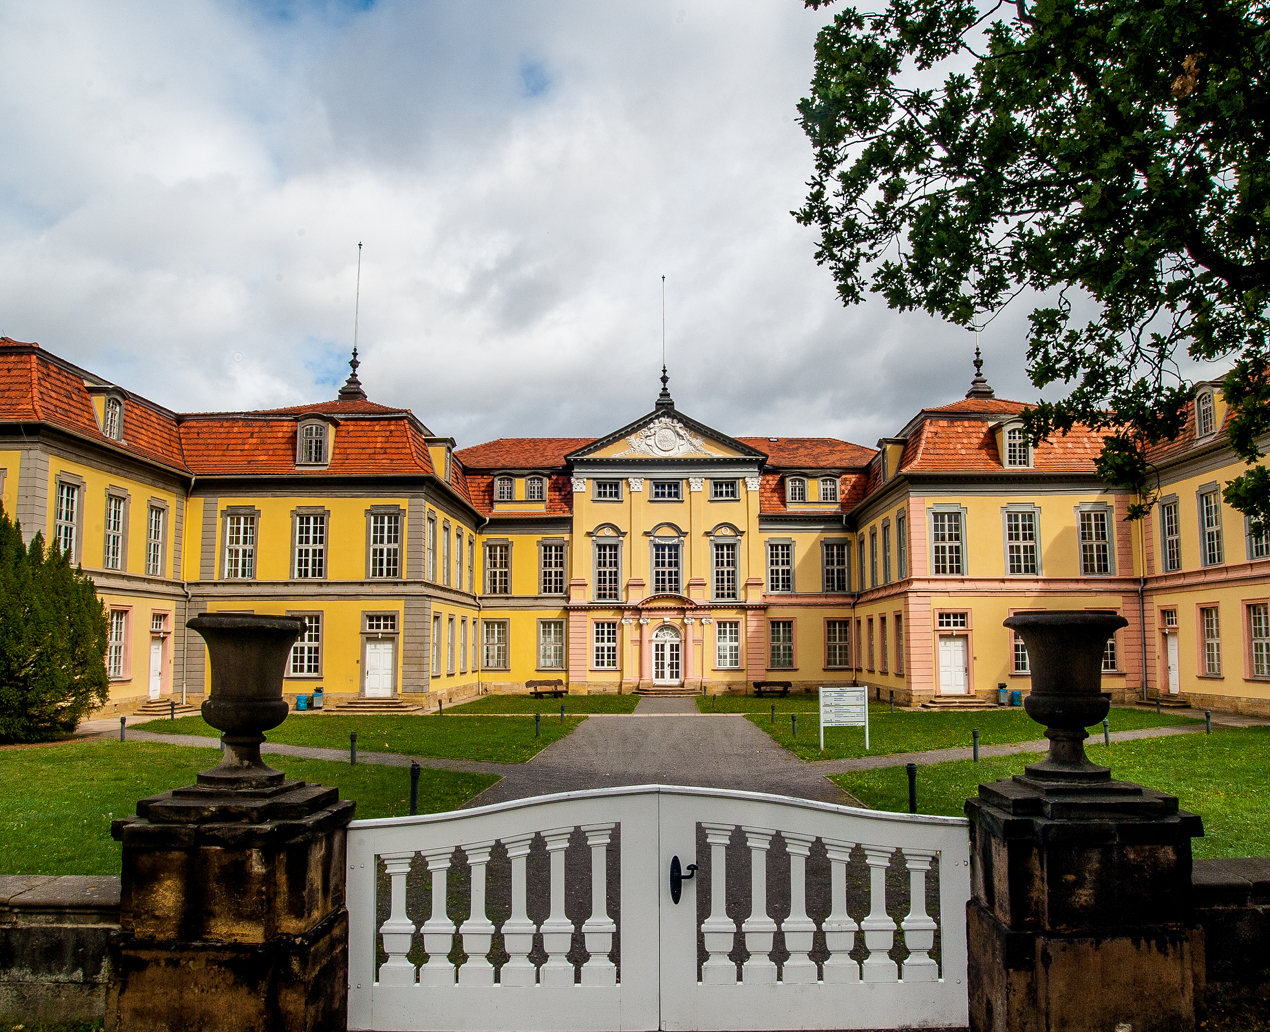 Schloss Friedrichsthal Gotha Archiv KulTourStadt ©J. Schröter